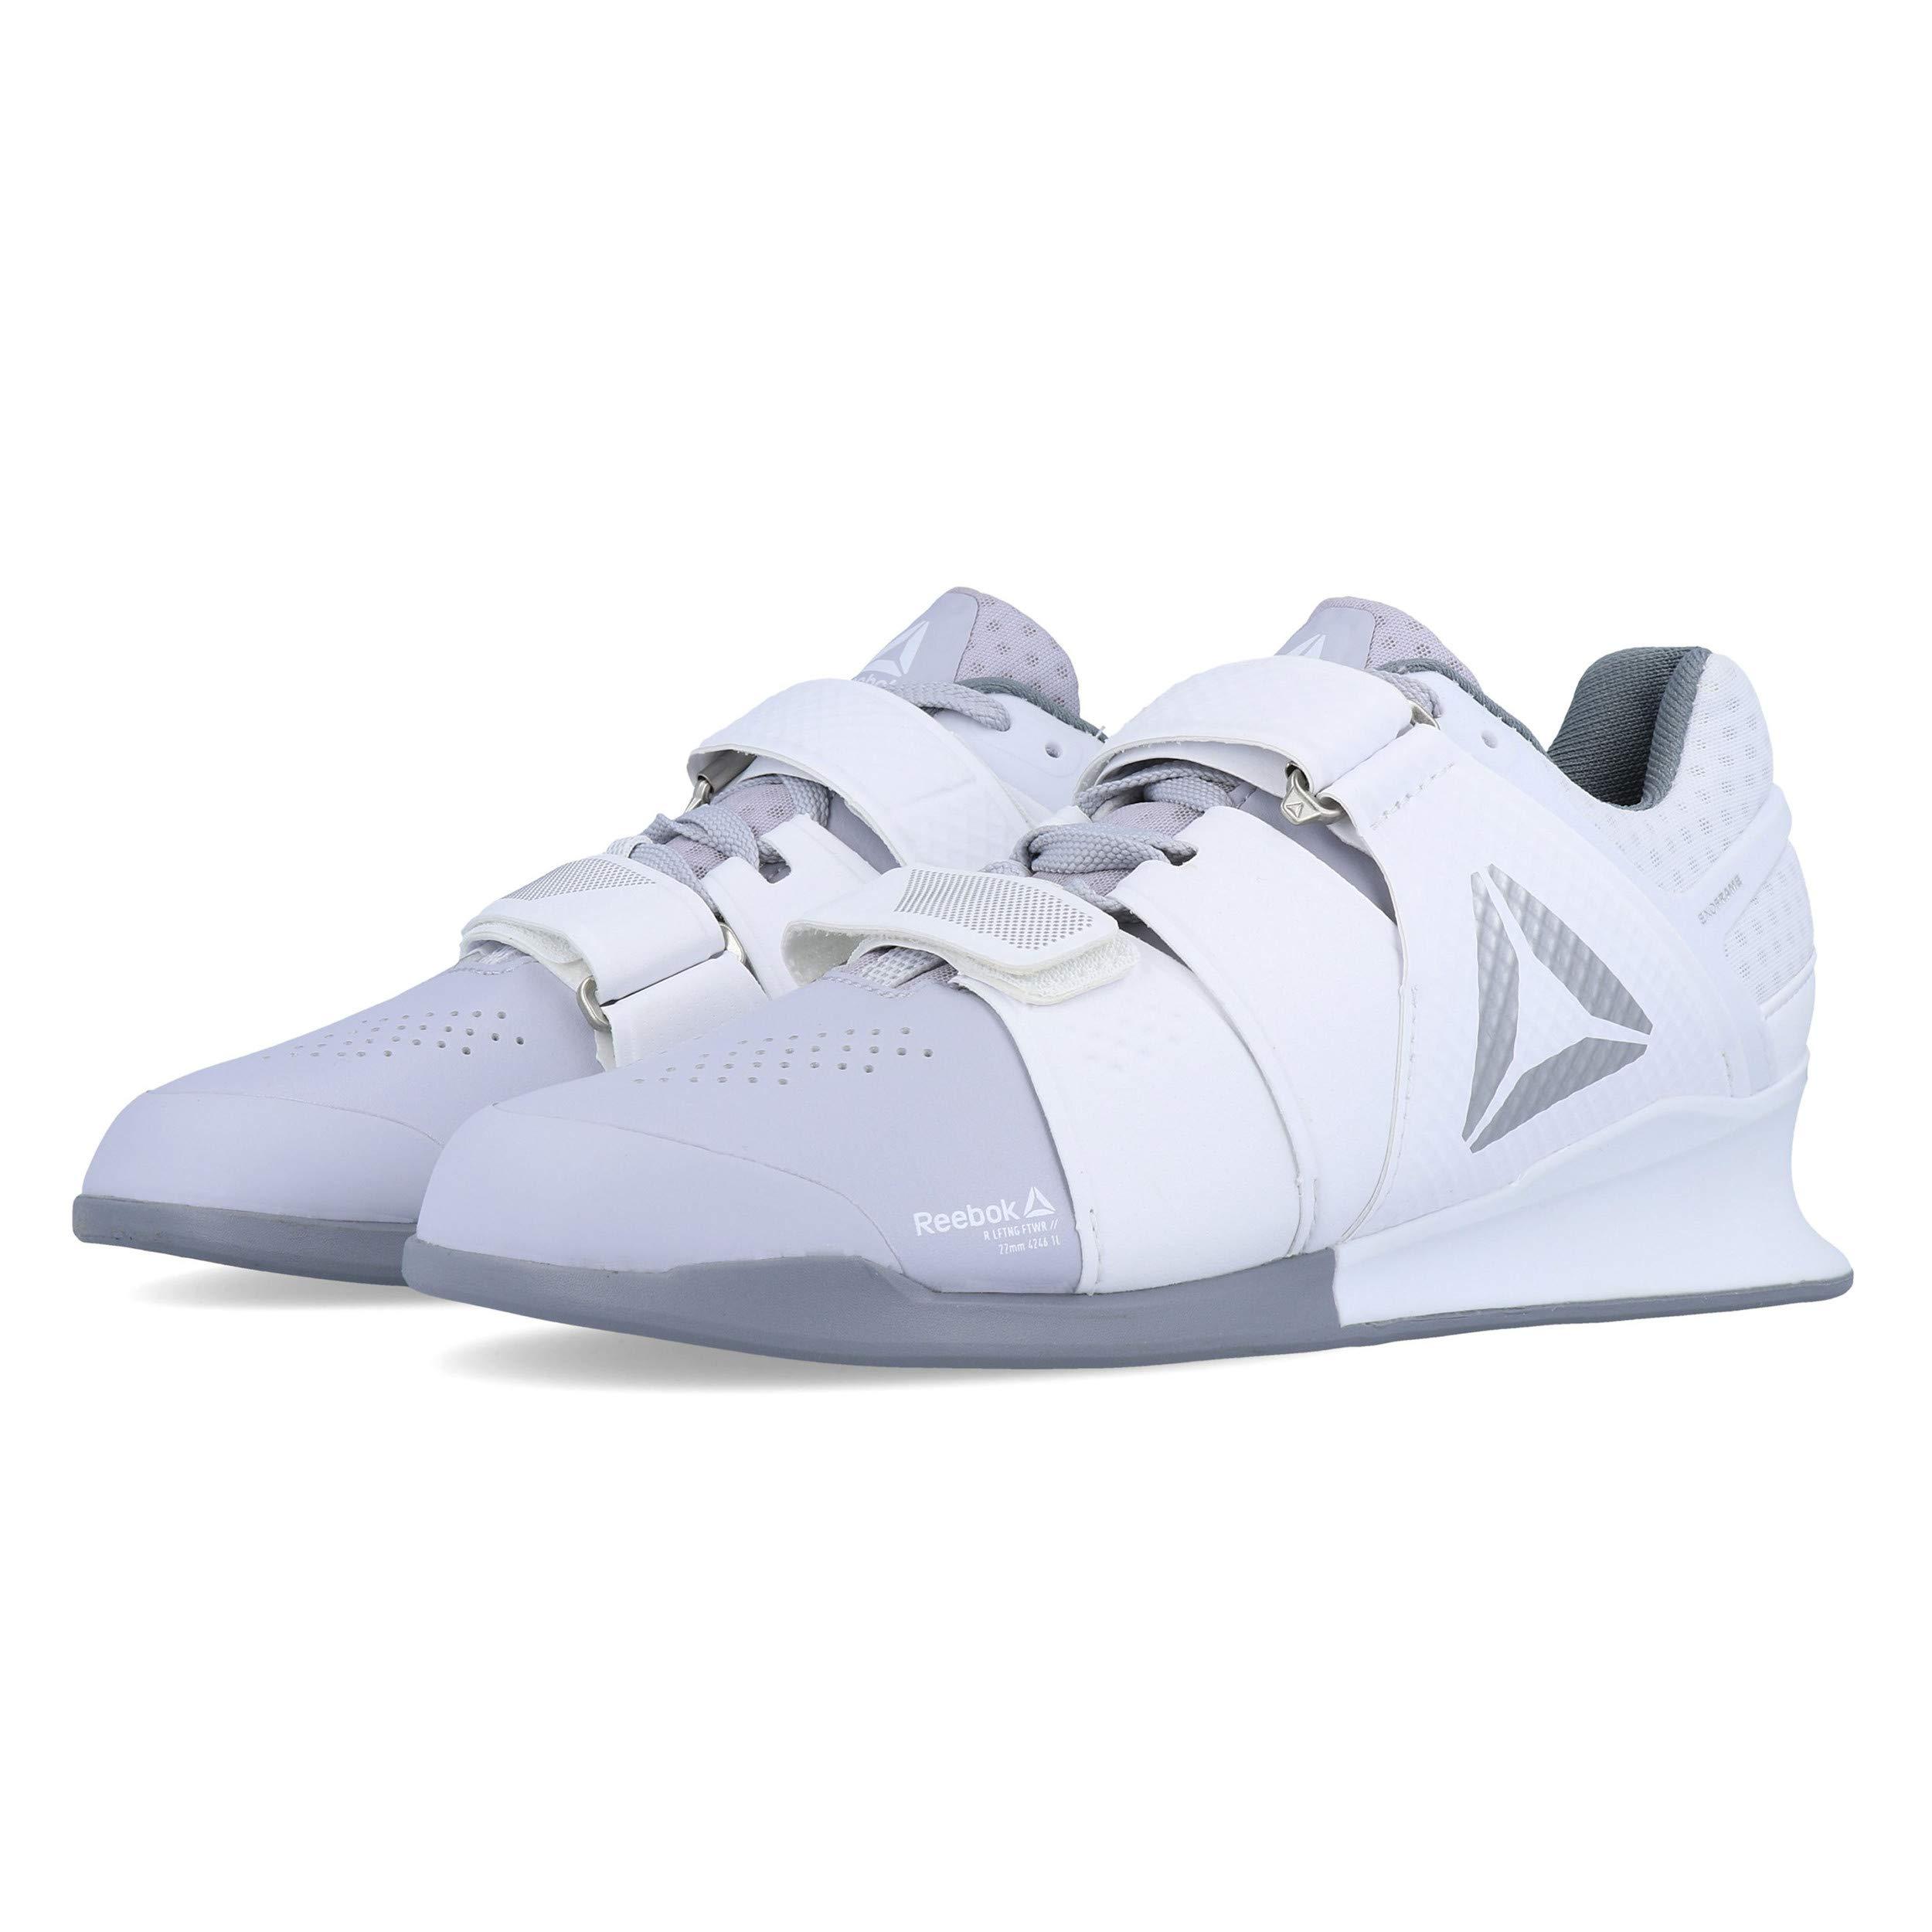 Reebok Legacy Lifter Women's Training Shoes - SS19-8 - Grey